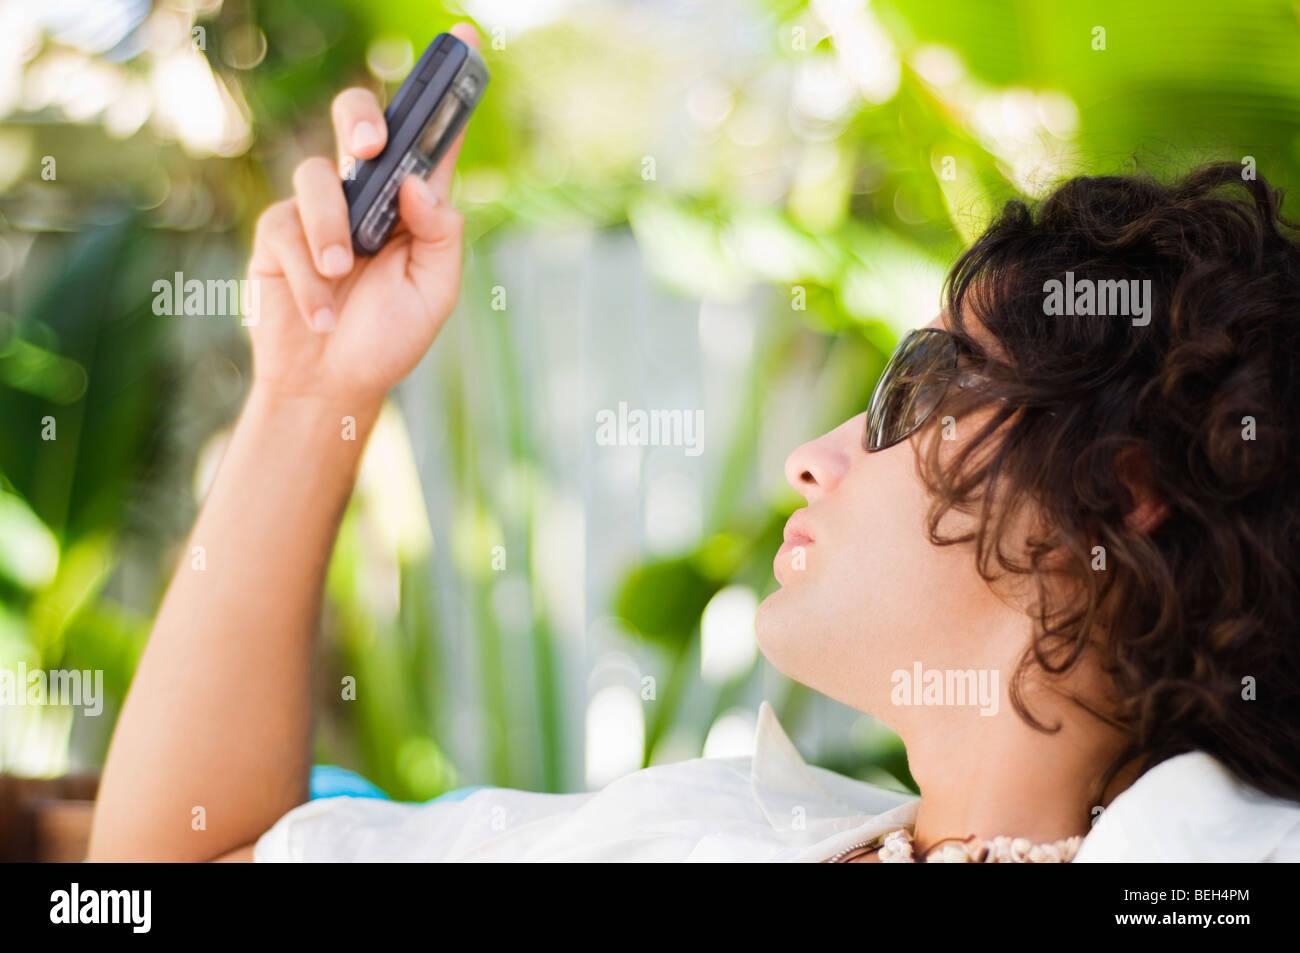 Close-up de un joven la mensajería de texto Foto de stock